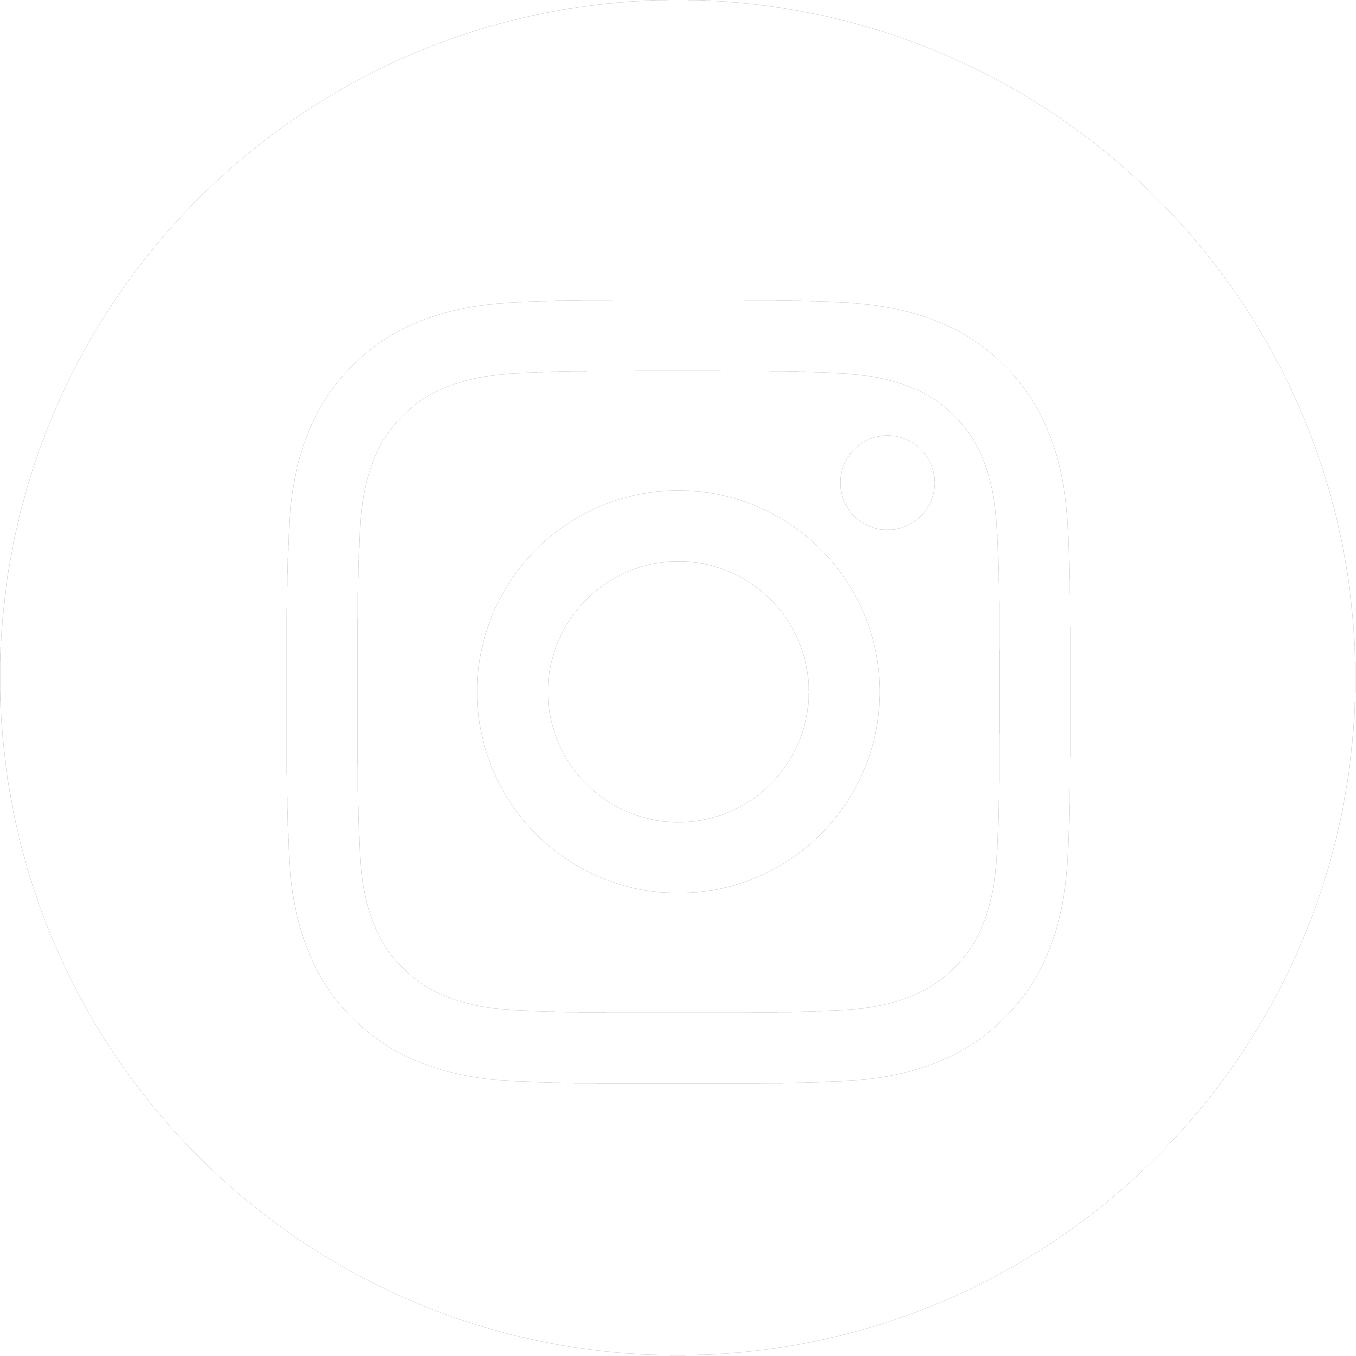 vcs_ru instagram